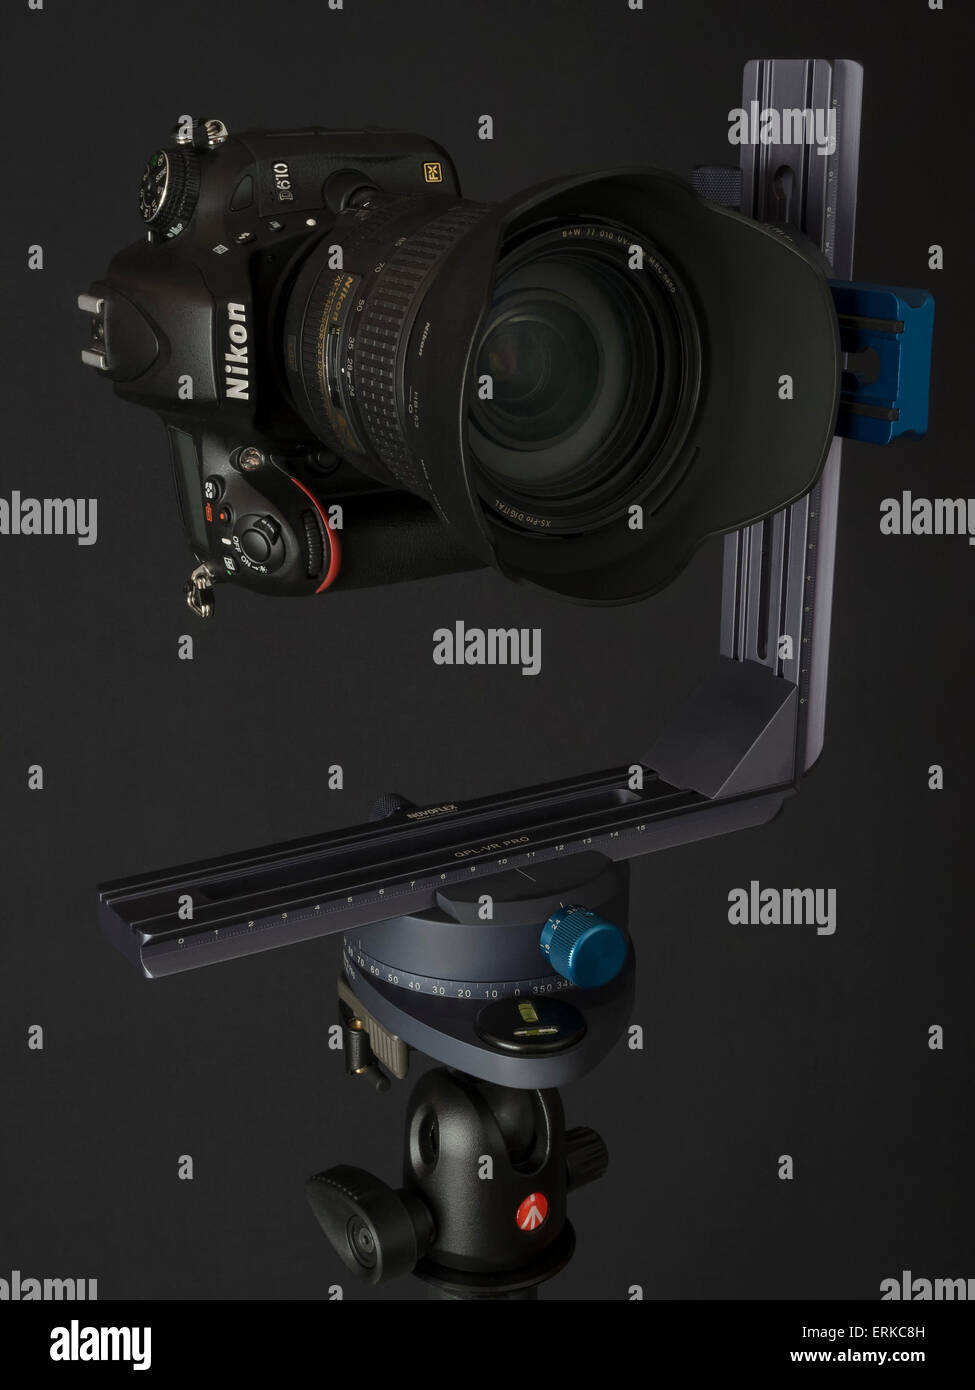 Novoflex VR System Pro 2, nodal point adapter, Manfrotto ball head, Nikon D610 camera, Nikon 24-120 f 4 VR, for - Stock Image